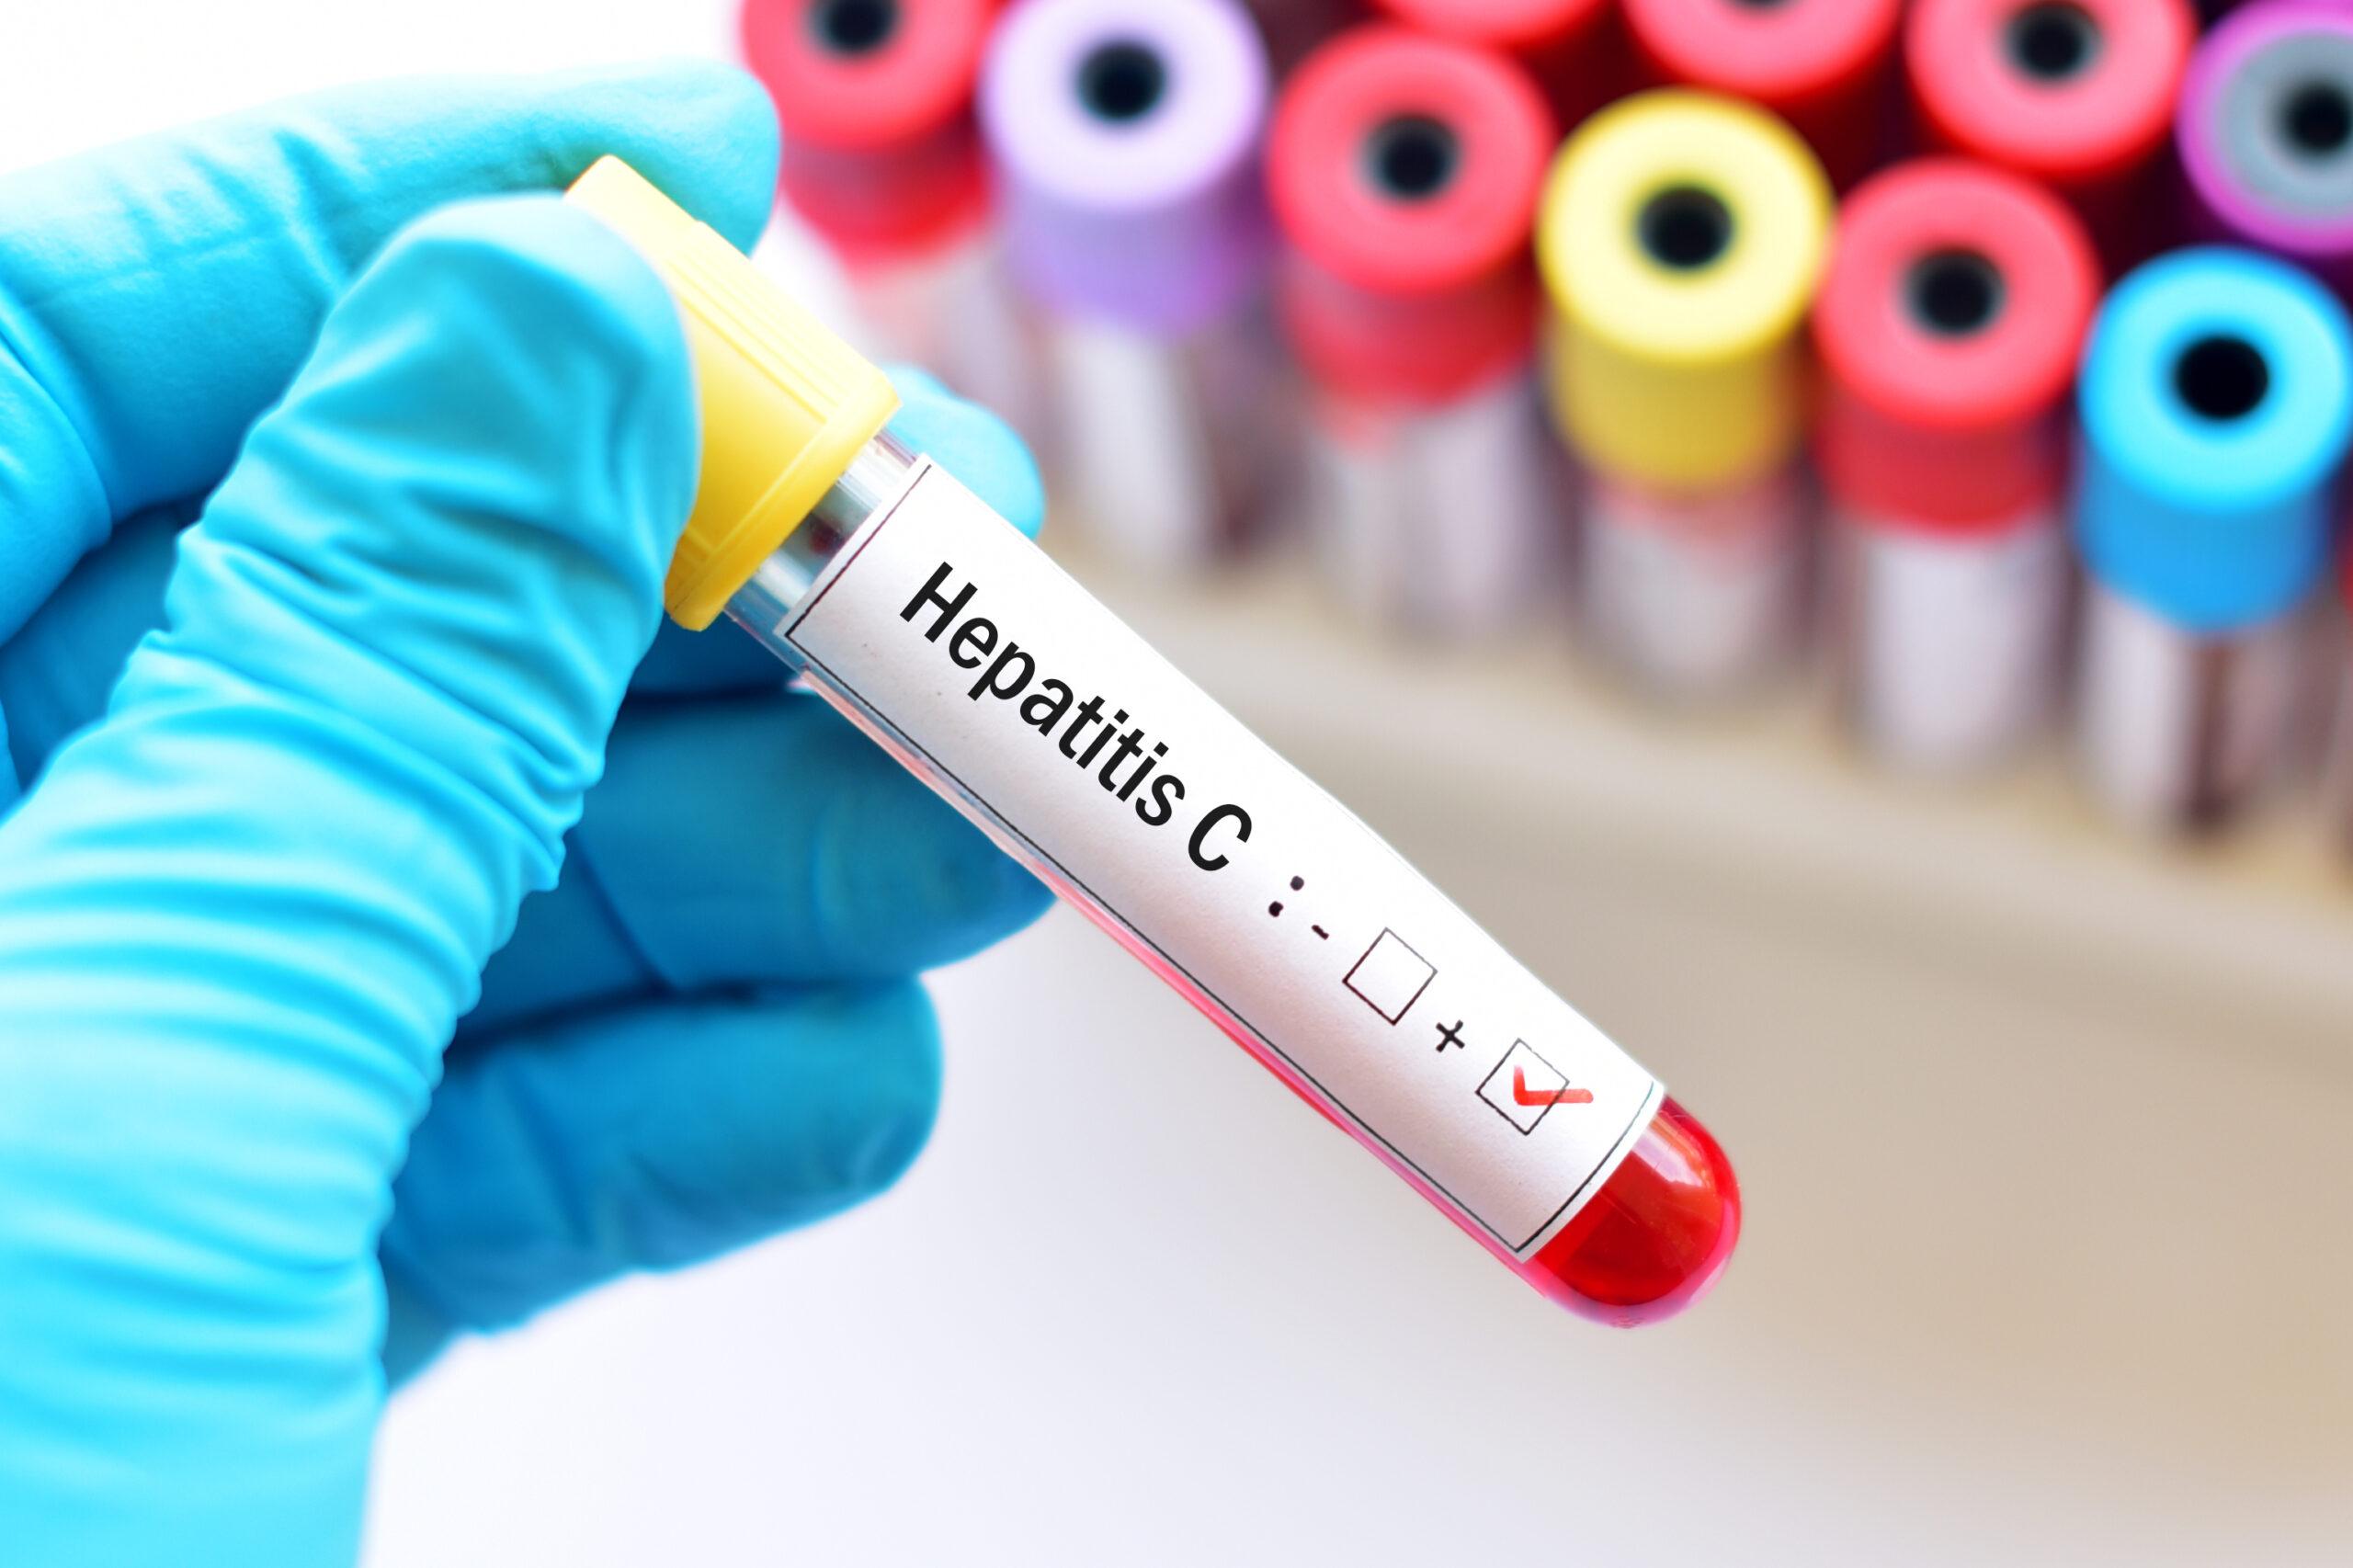 Blood,Sample,With,Hepatitis,C,Virus,(hcv),Positive